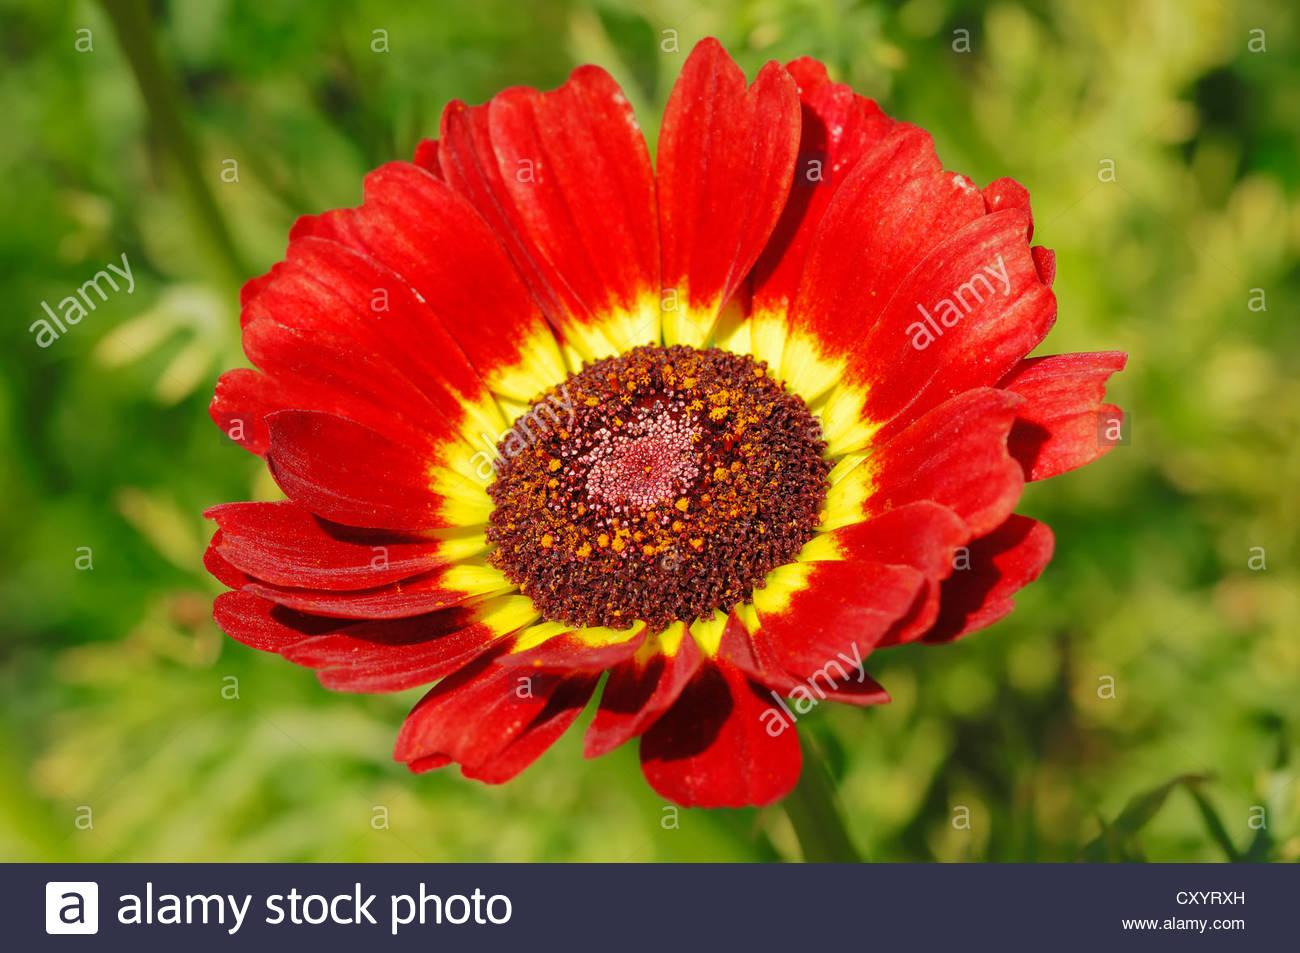 Painted Daisy Flower Stock Photos & Painted Daisy Flower Stock.